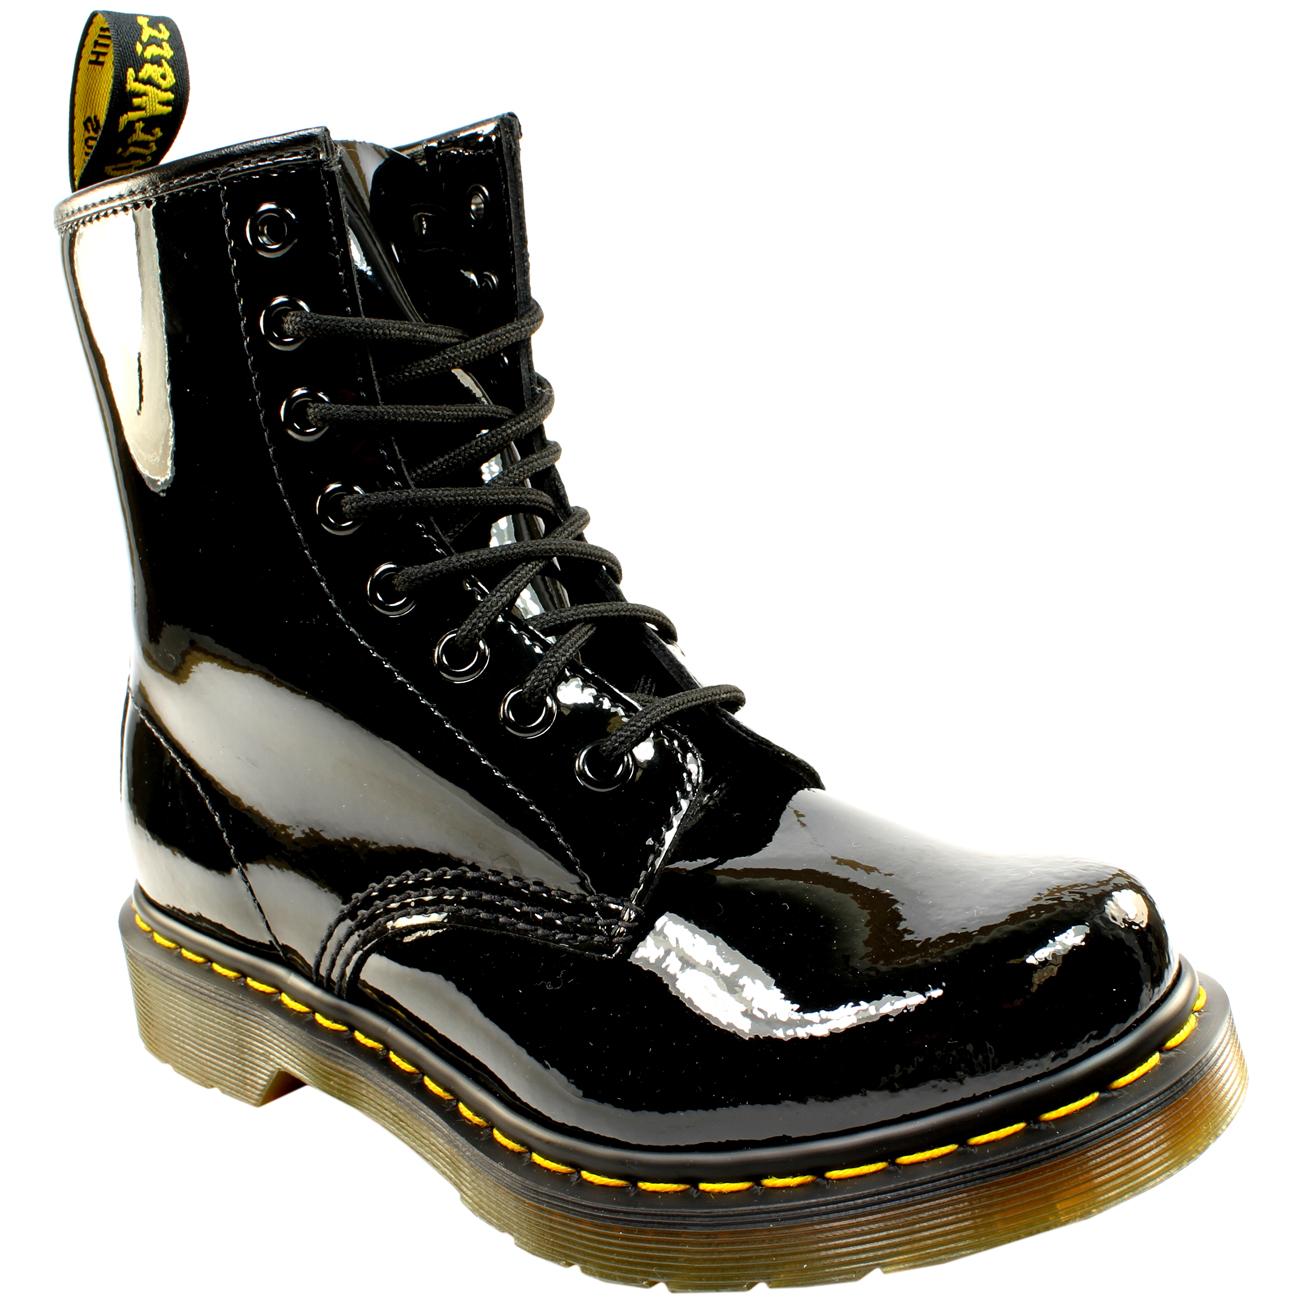 Dr Martens 1460 W Boots